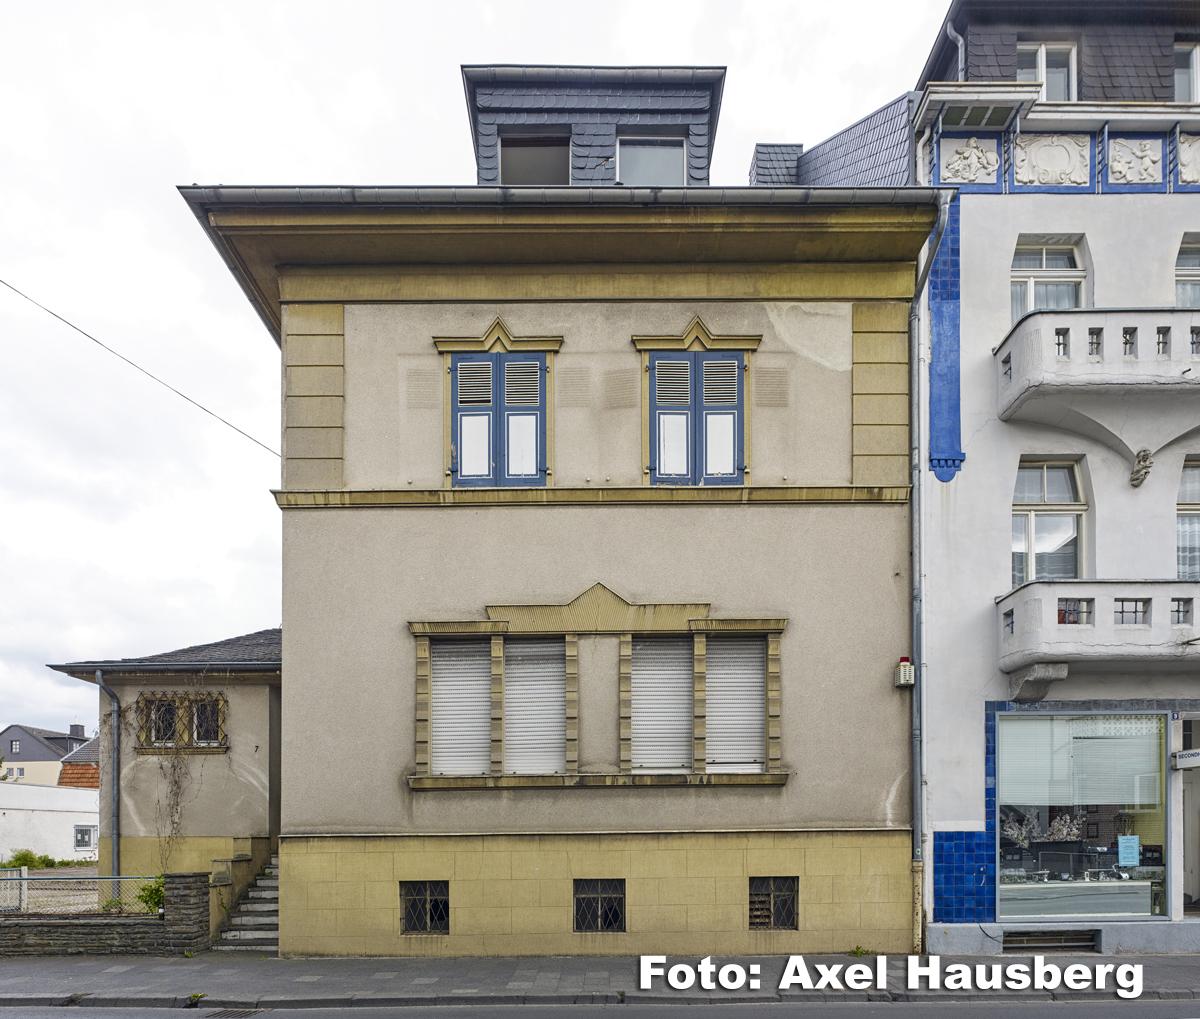 Historische Gebäude in Not/verloren - lebenswertestadt